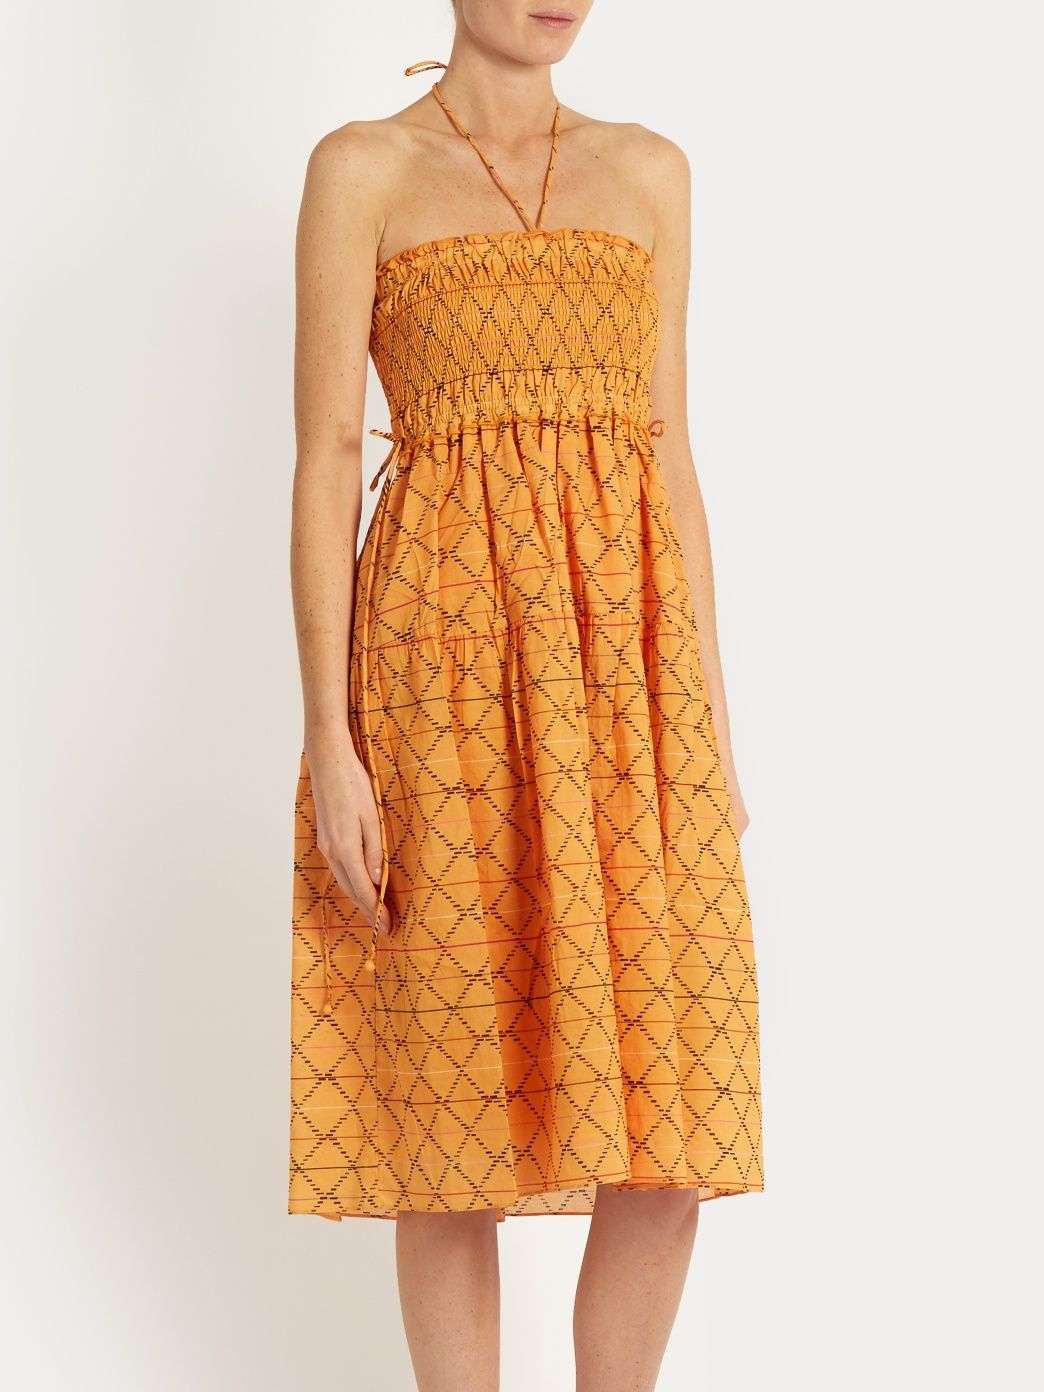 Nueva Nambe smocked-cotton dress | APIECE APART | MATCHESFASHION.COM